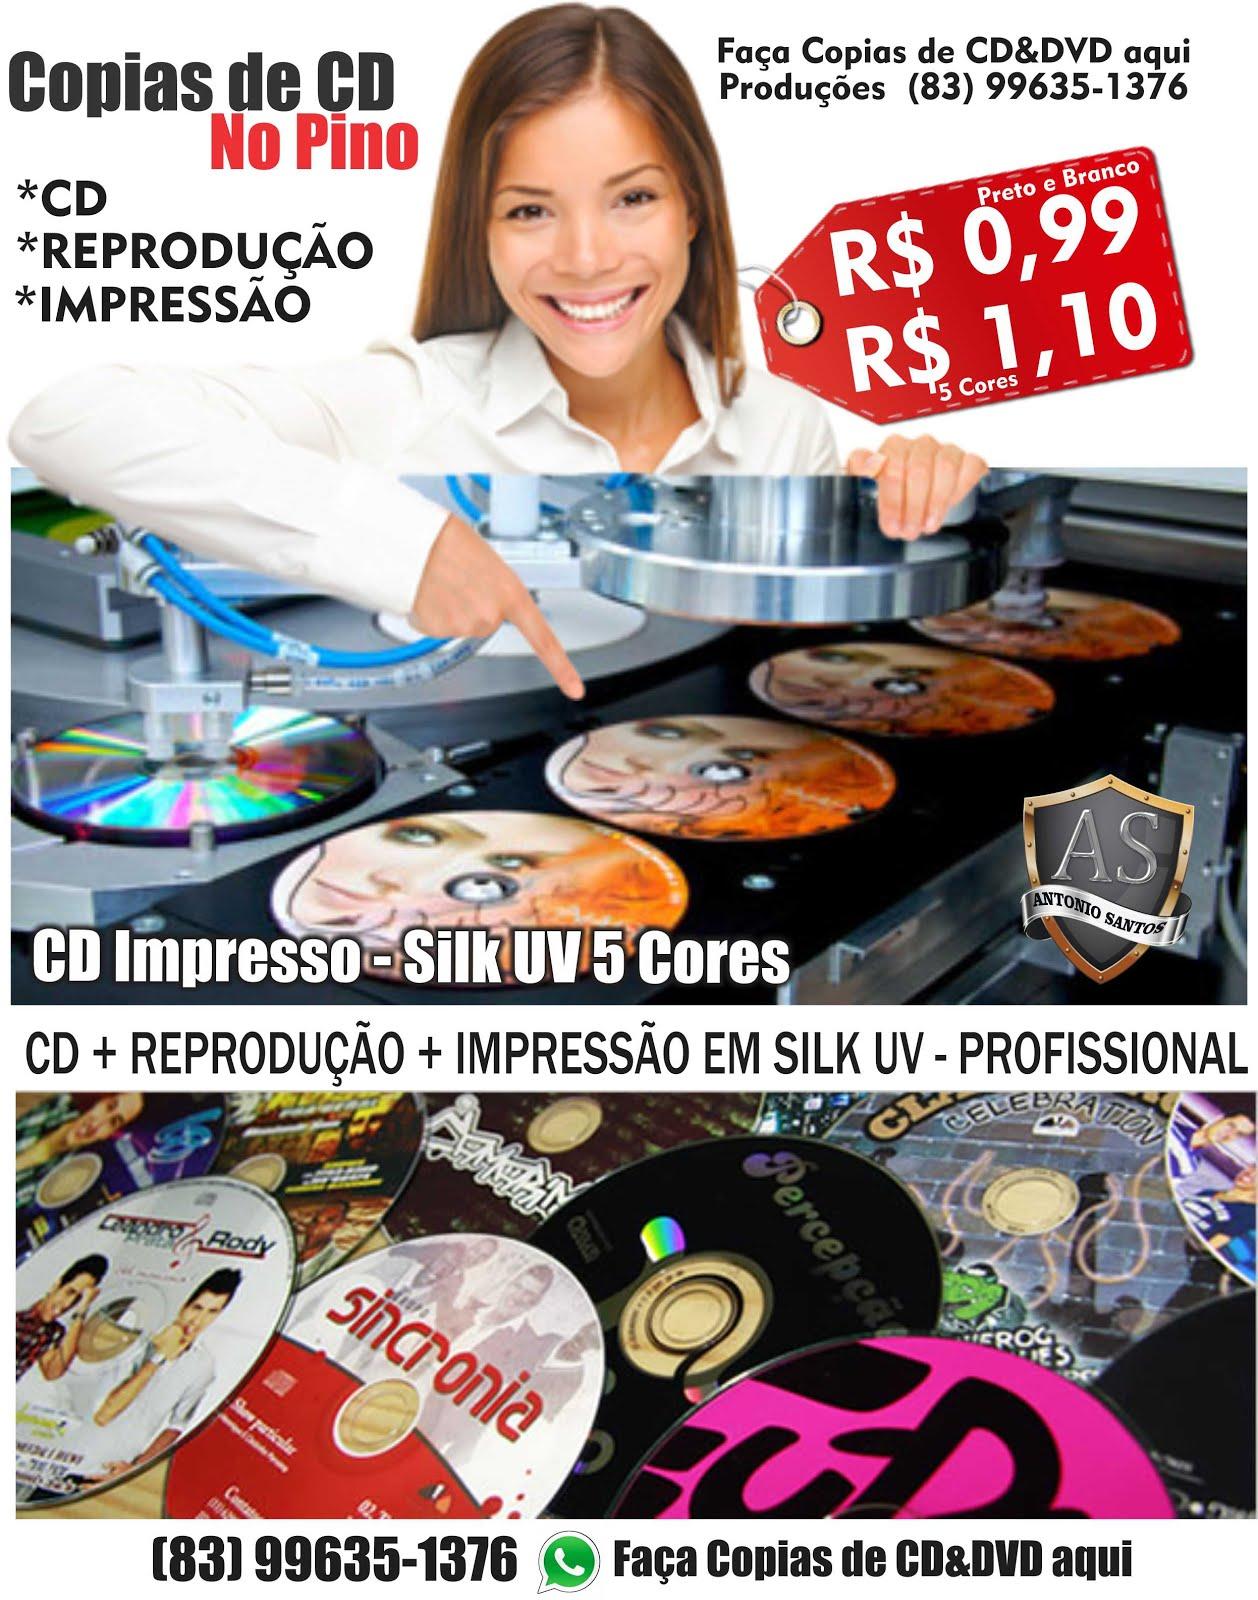 CD NO PINO